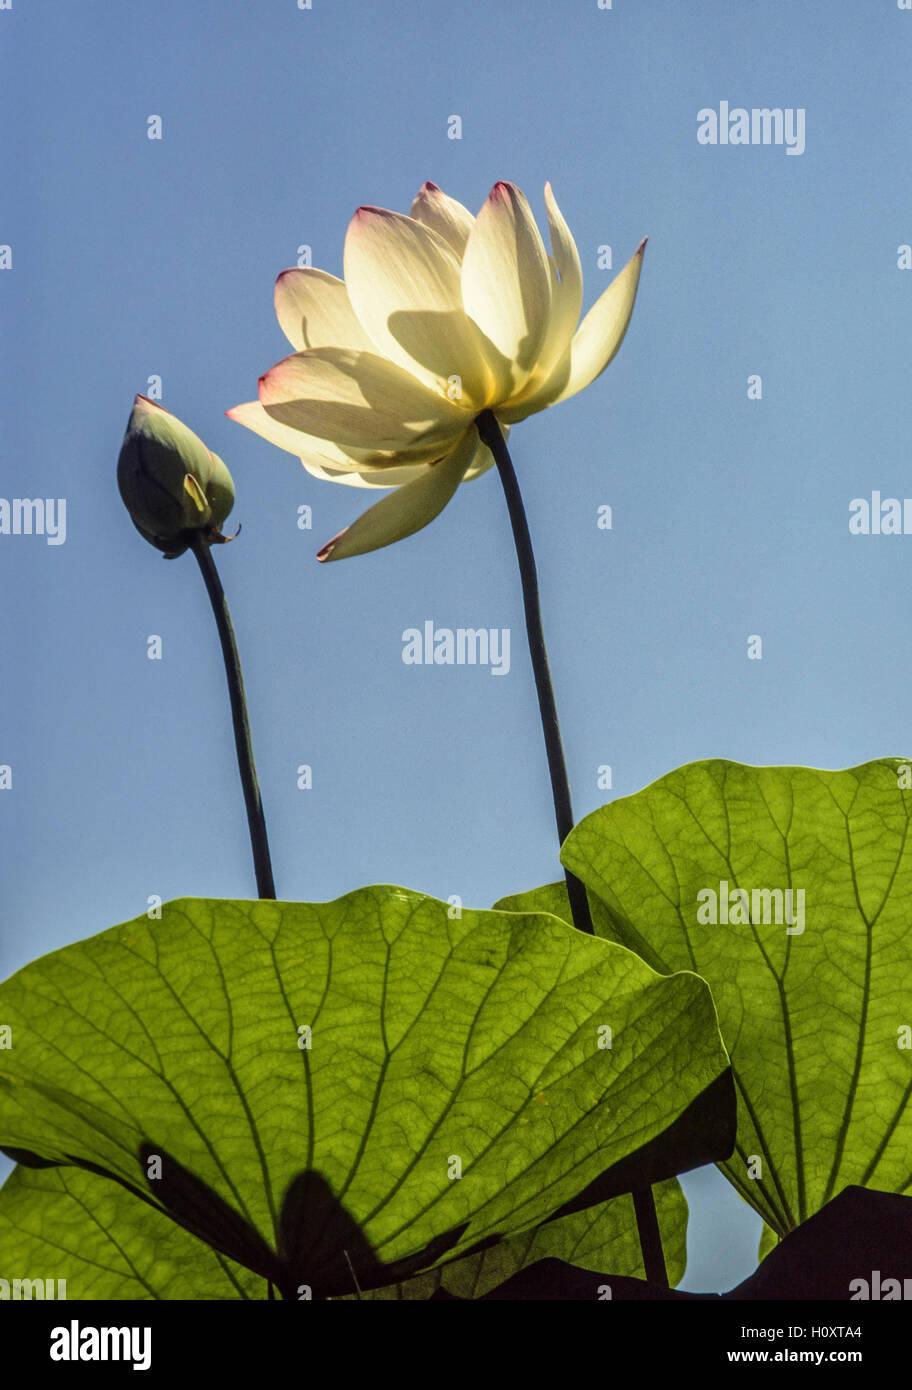 Chinese lotus flower stock photos chinese lotus flower stock chinese loutus flowerbud and leaves stock image izmirmasajfo